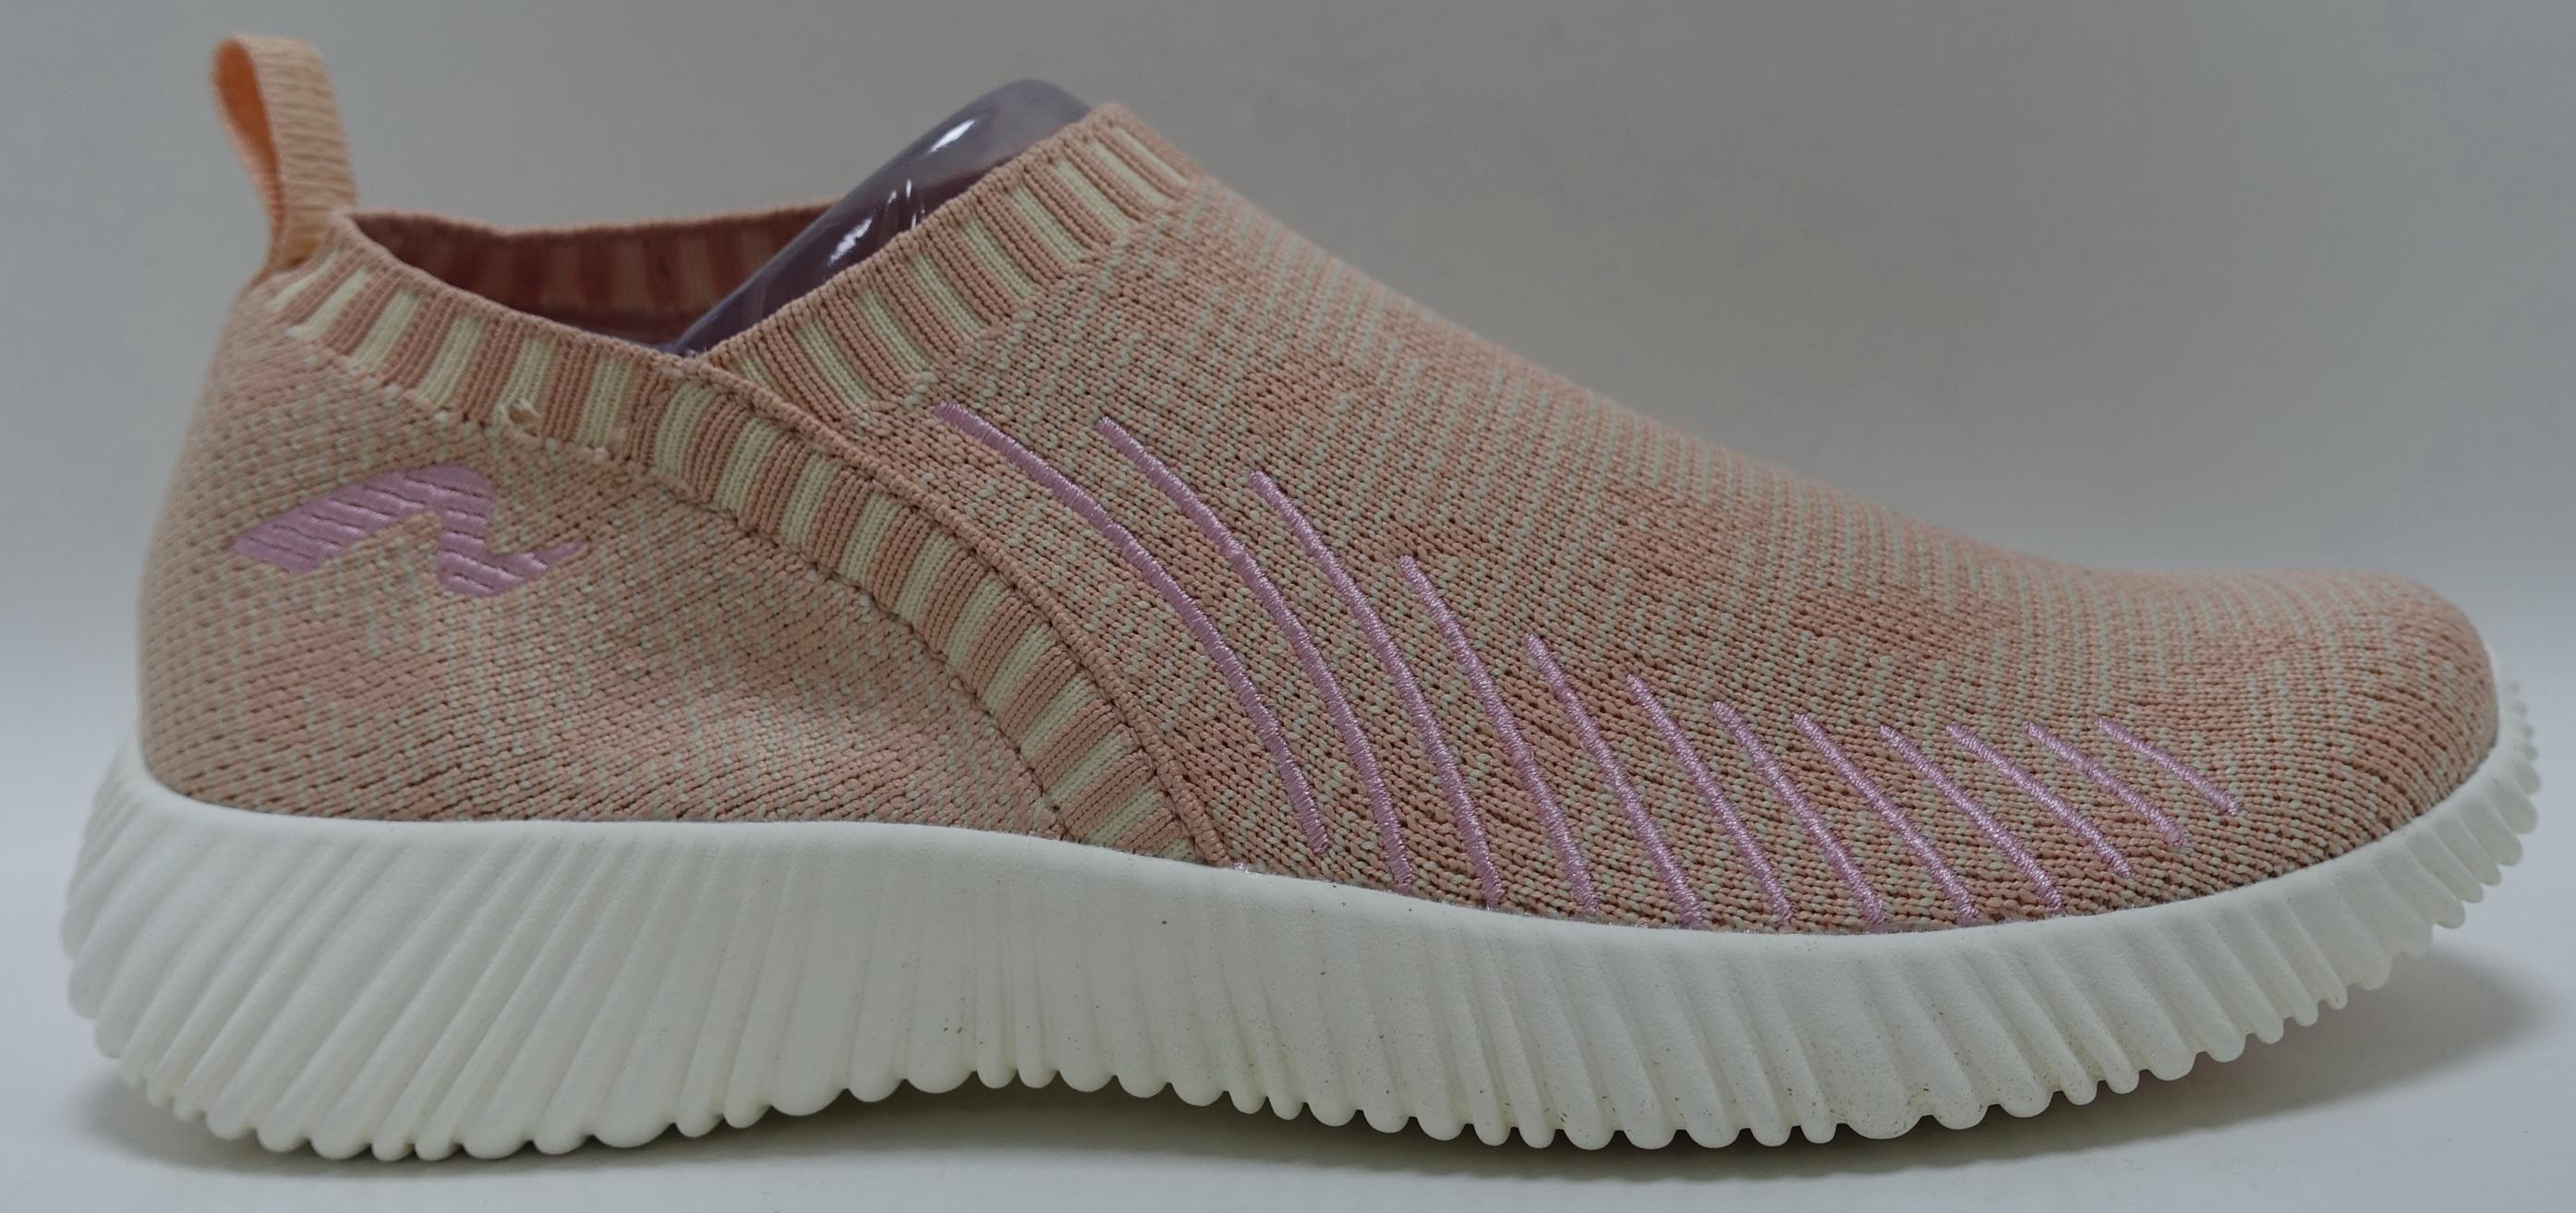 Wholesale Flyknit Men Shoes